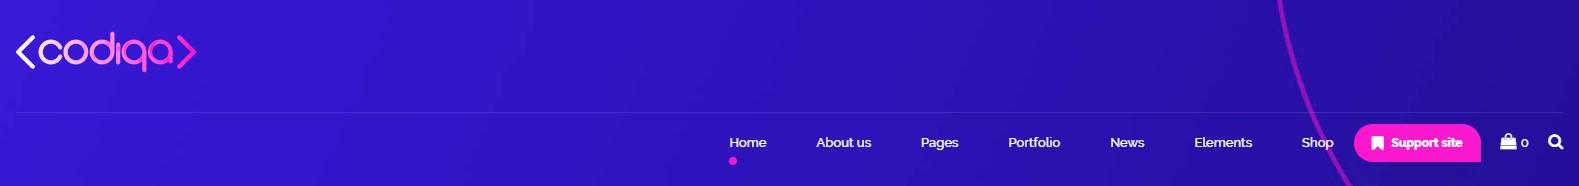 https://documentation.bold-themes.com/codiqa/wp-content/uploads/sites/49/2019/10/menu-below-right.jpg